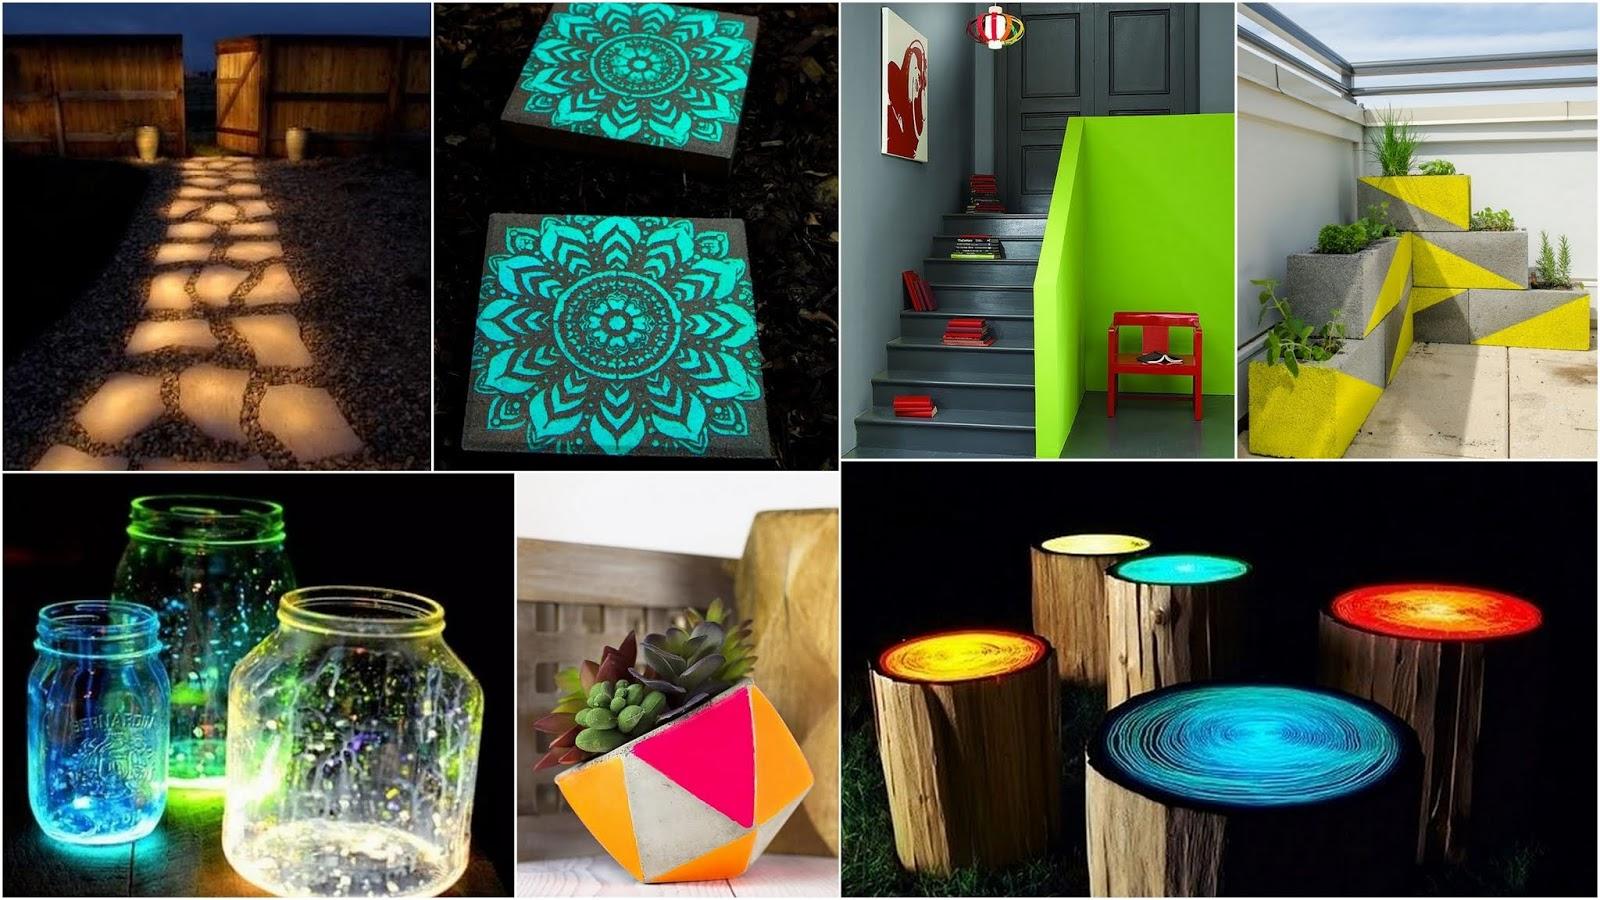 DIY Ιδέες-Κατασκευές με χρώματα που φωσφορίζουν στο σκοτάδι - Φωτογραφία 2